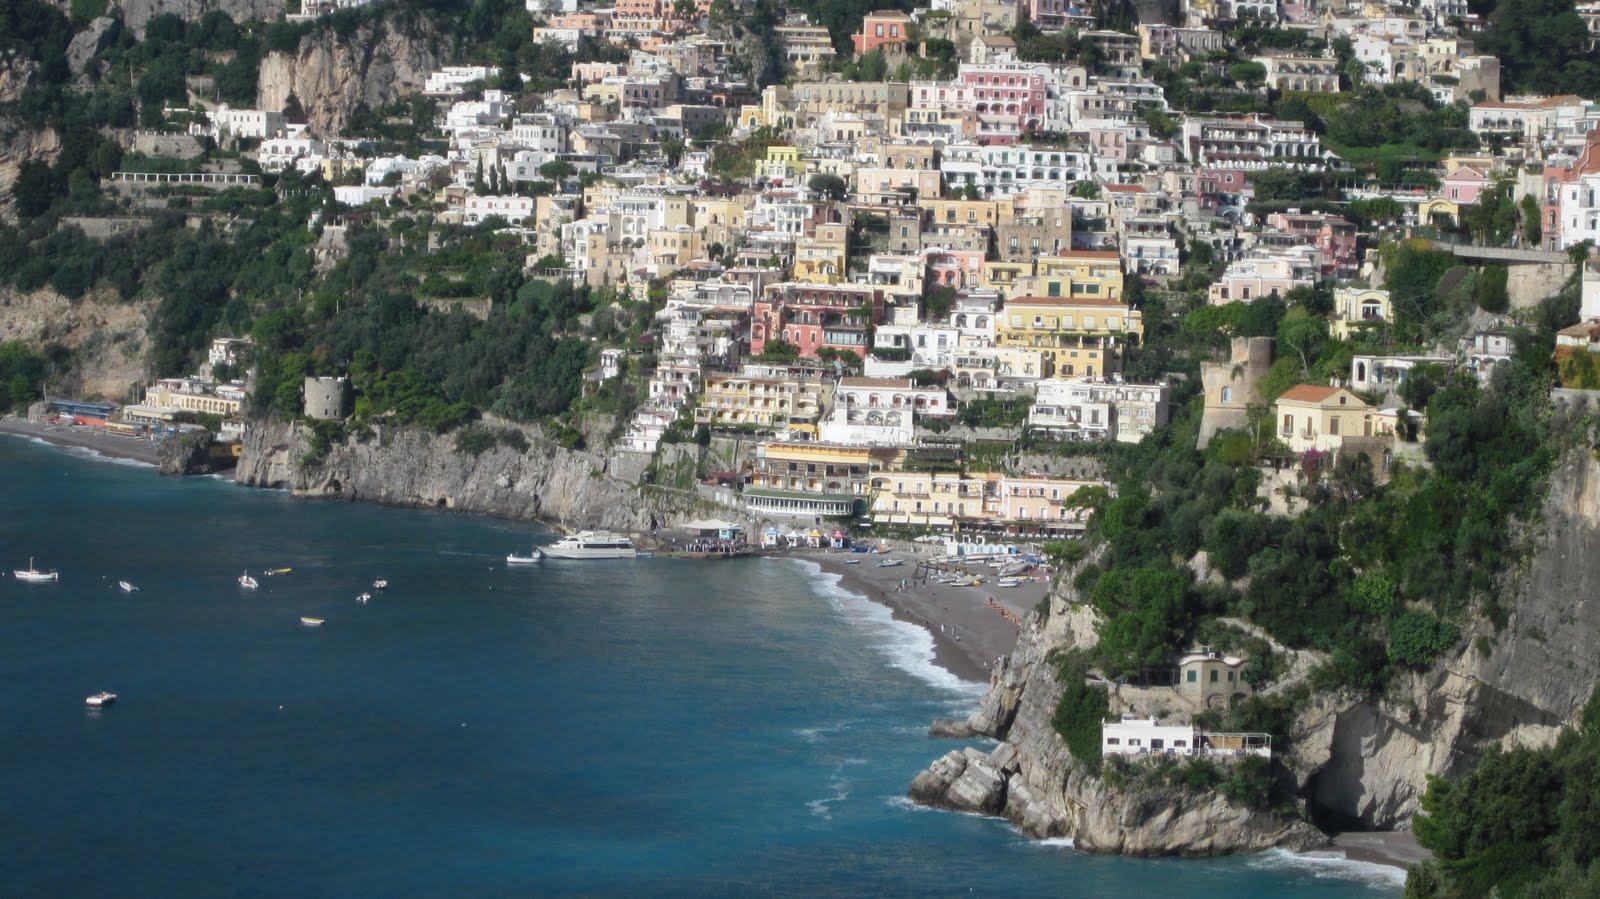 http://1.bp.blogspot.com/_HL6tGQvHtW8/TL3ZwQJAXaI/AAAAAAAAAL8/3G4jjwbzNvY/s1600/Positano+Amalfi+Coast+009.jpg